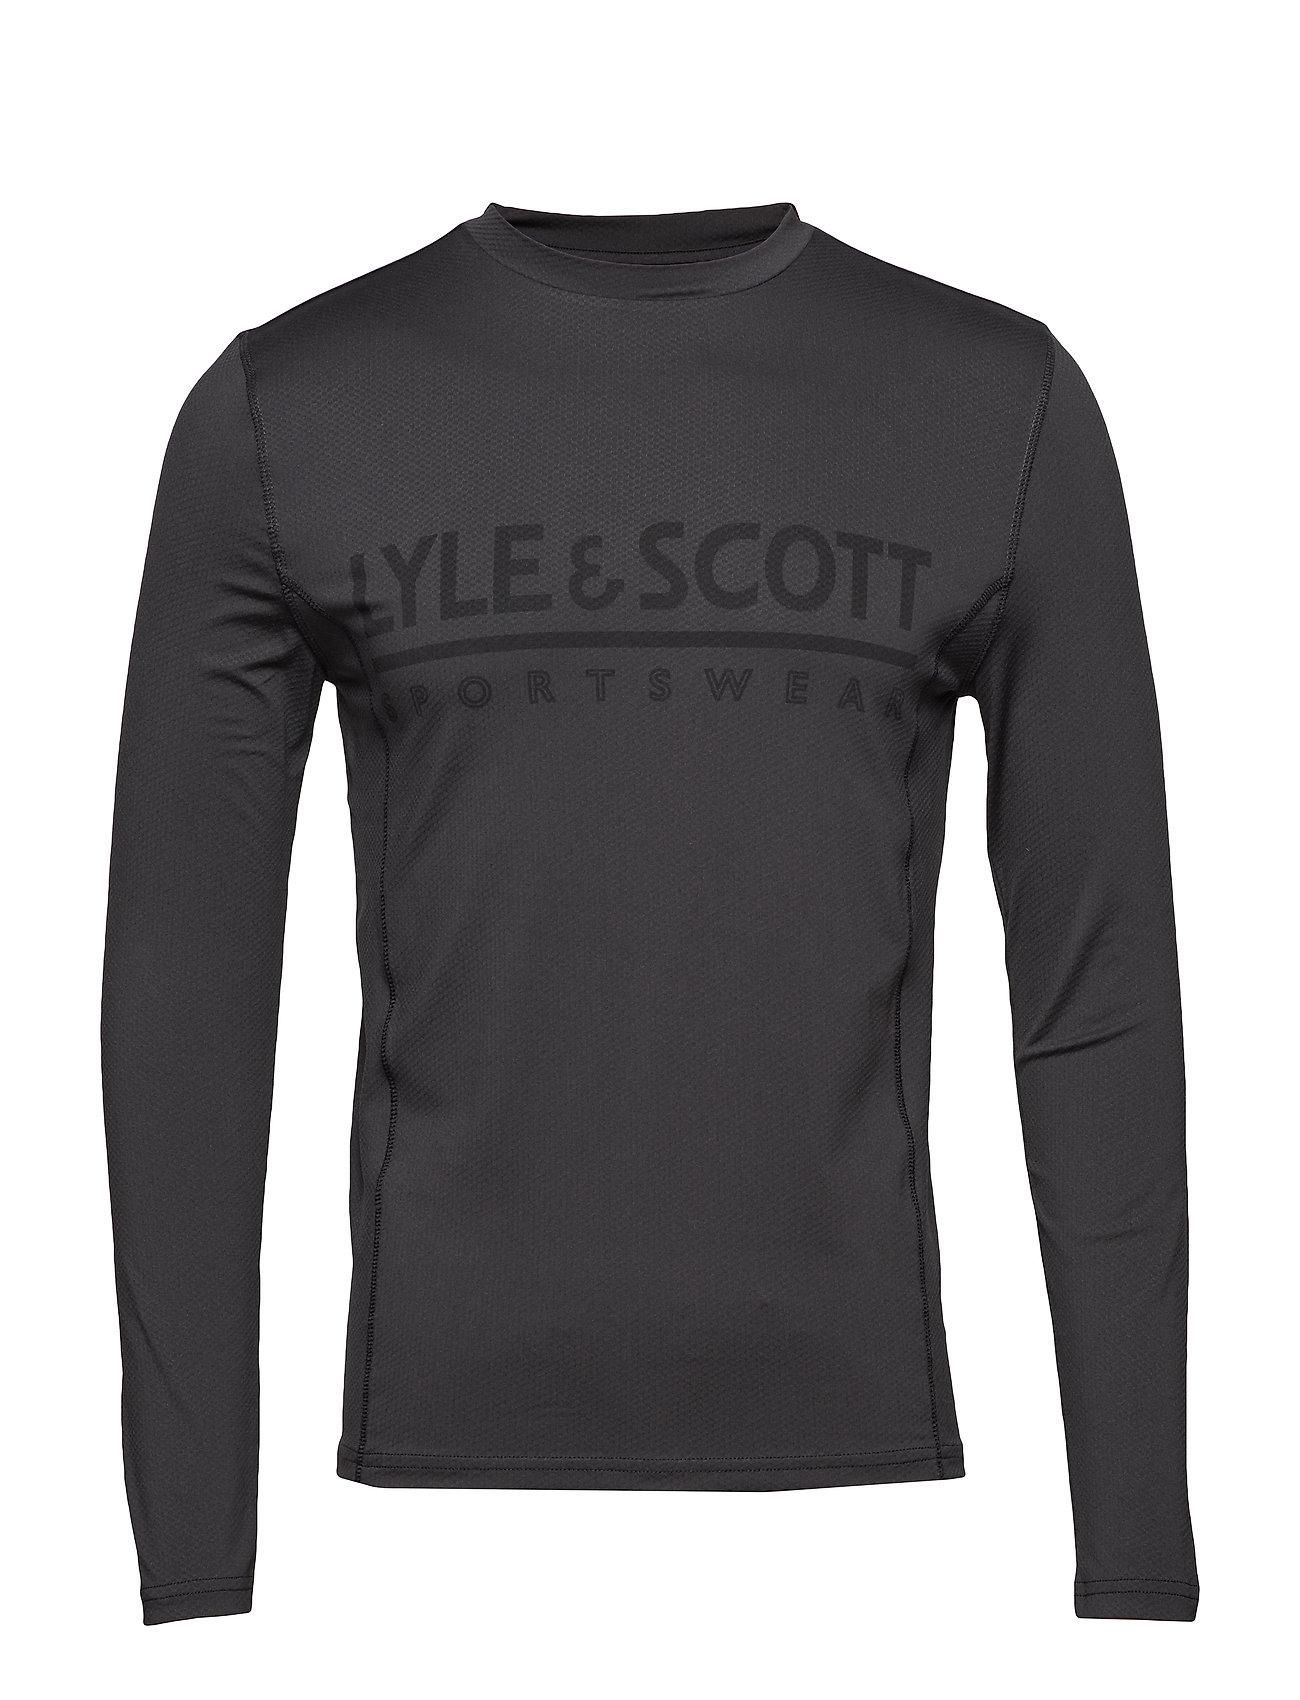 Image of Base Layer Base Layer Tops Long-sleeved Sort LYLE & SCOTT SPORT (3174661293)